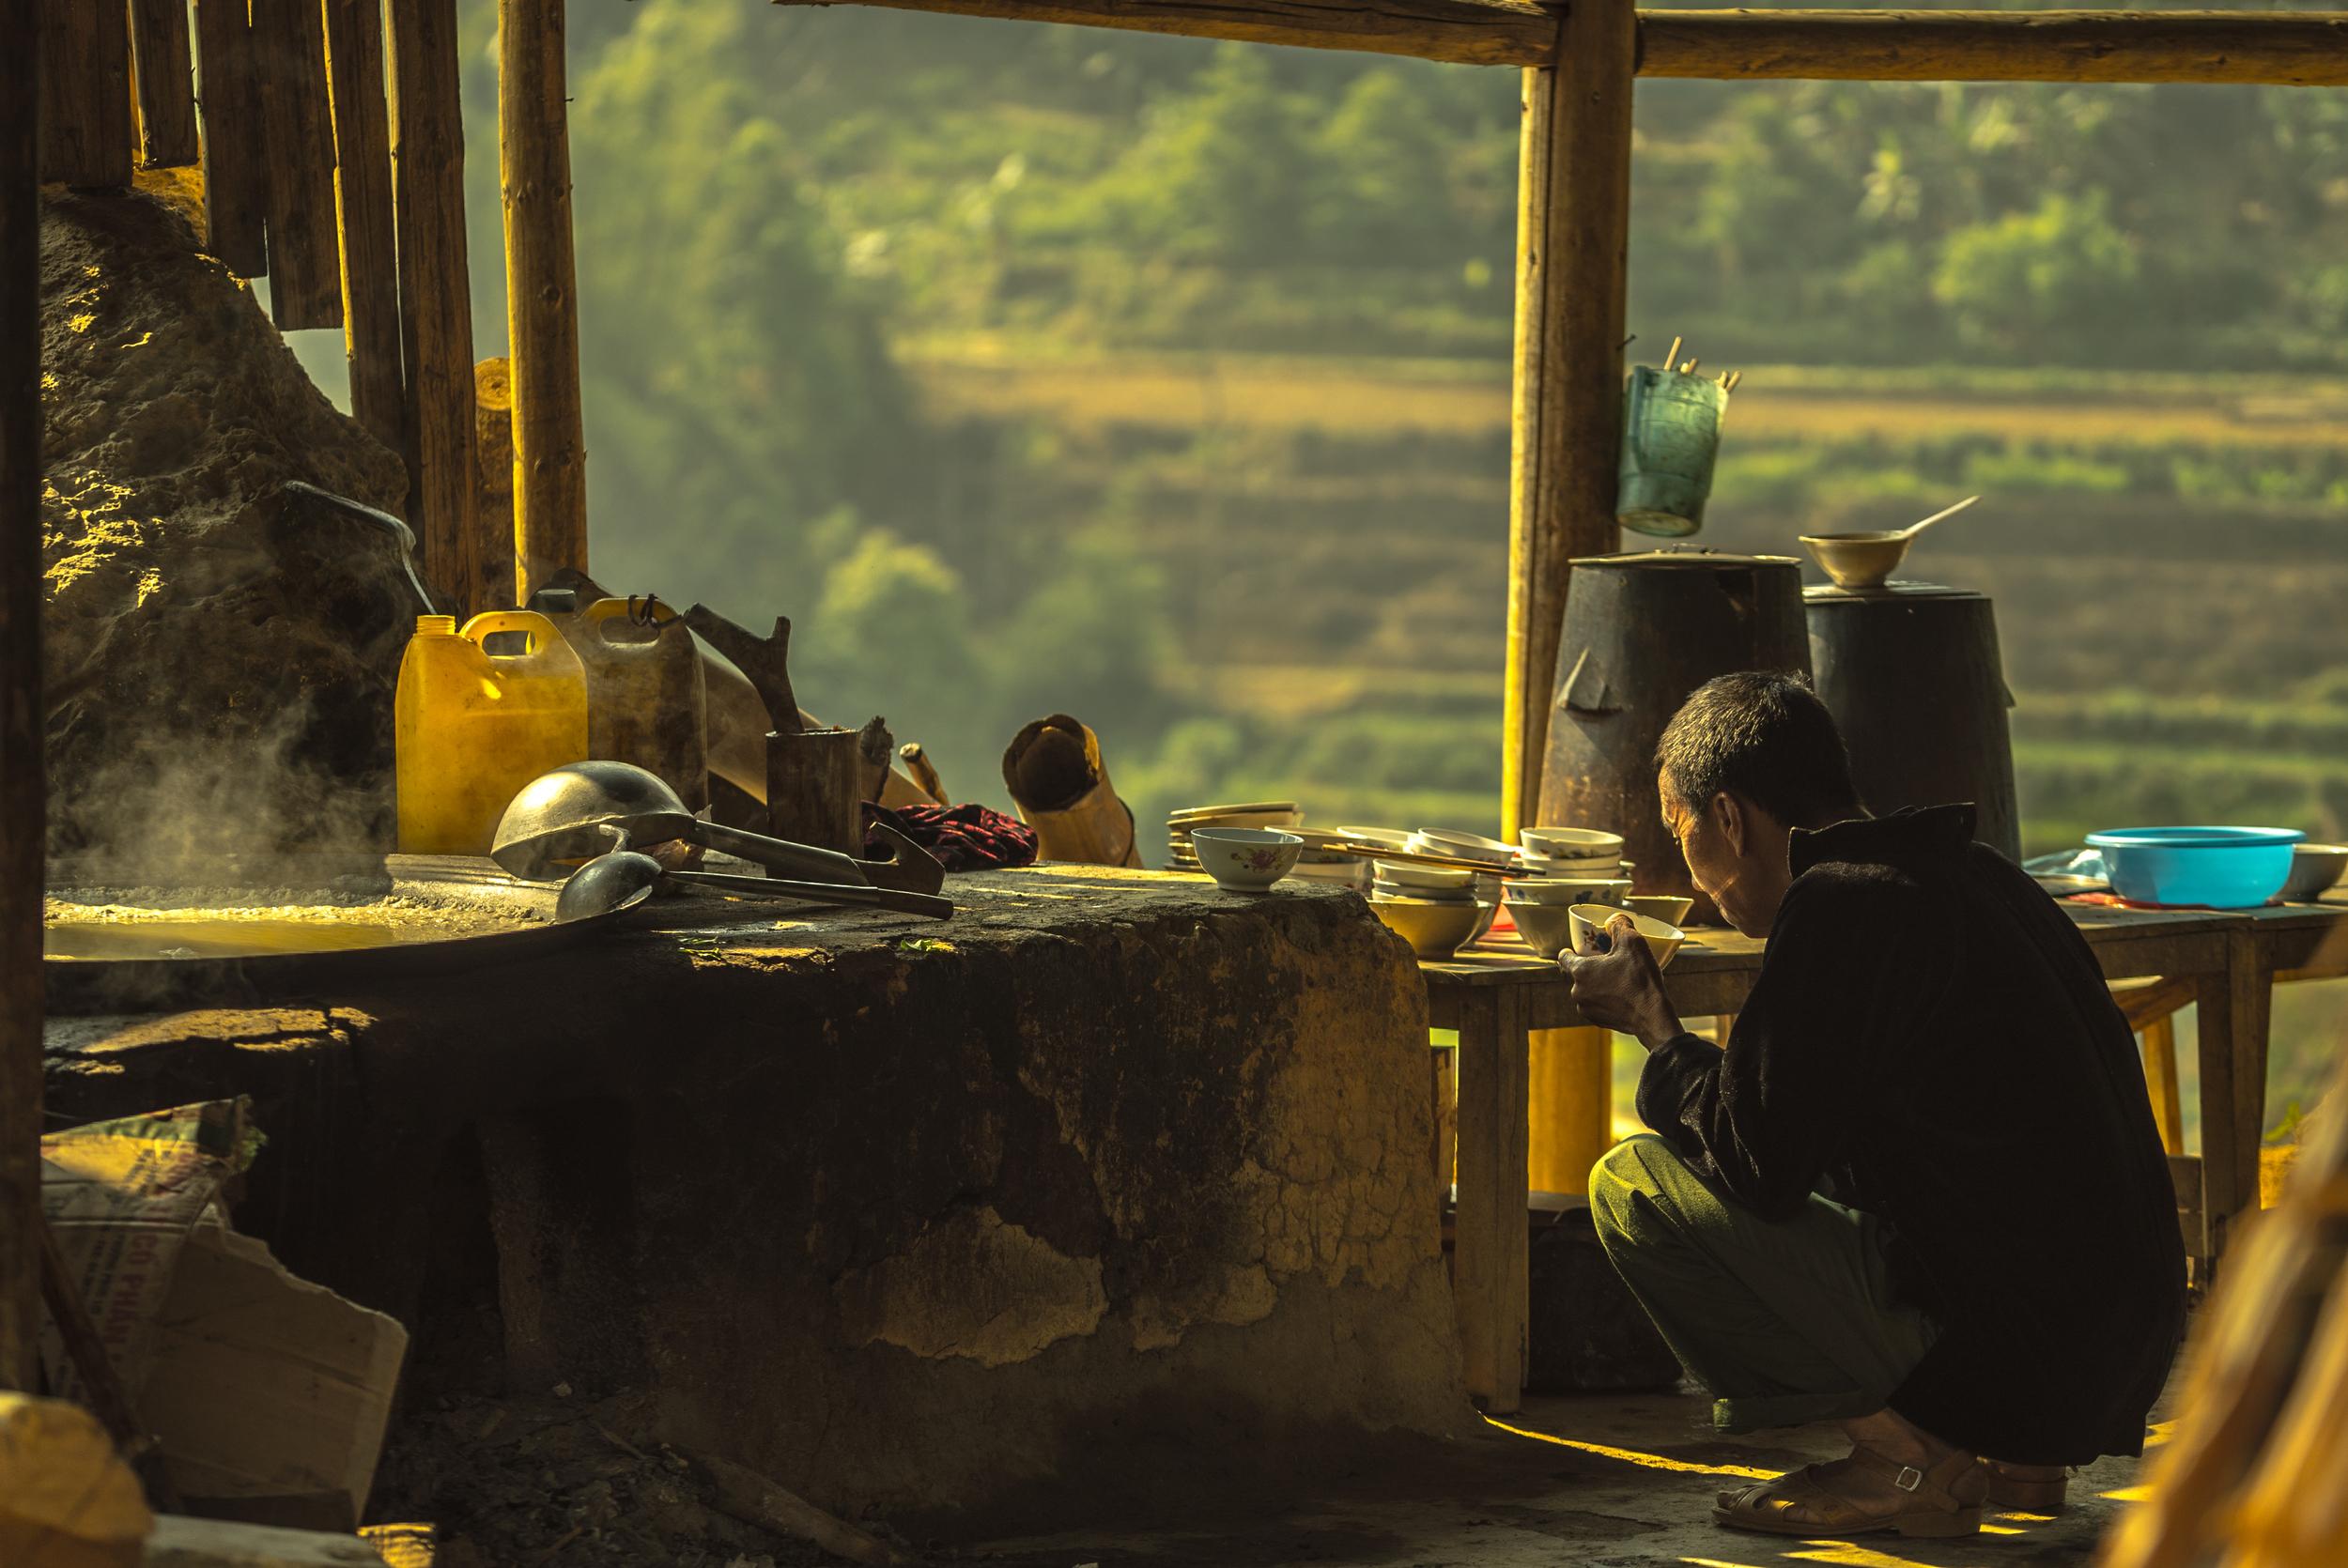 Sunrise soup. Can Cau, Vietnam